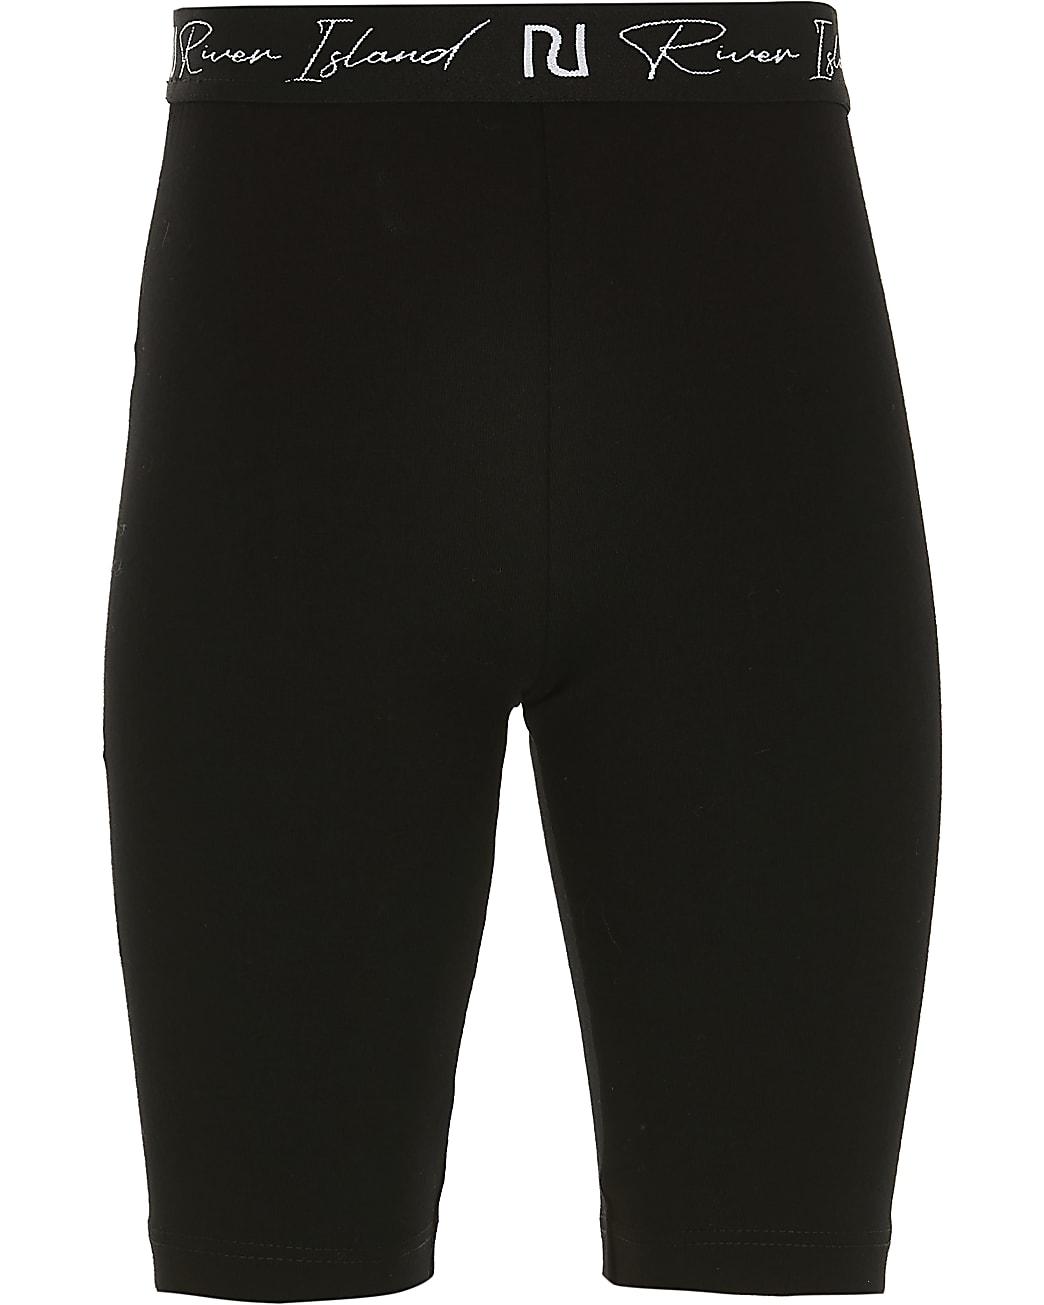 Girls black RI waistband cycling shorts